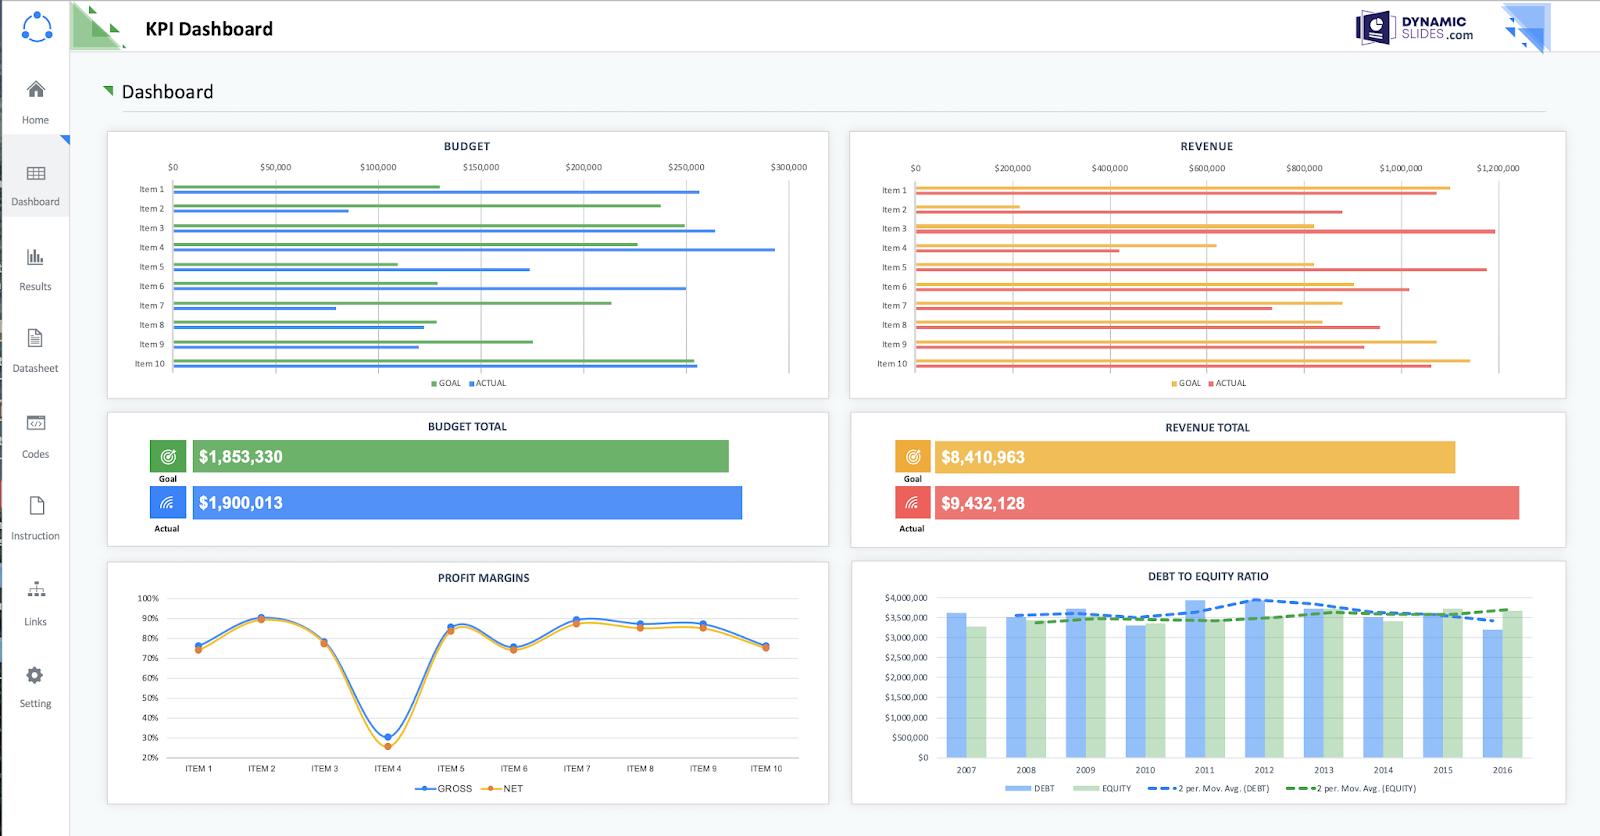 Kpi Business Free Dashboard Template Dynamic Slides